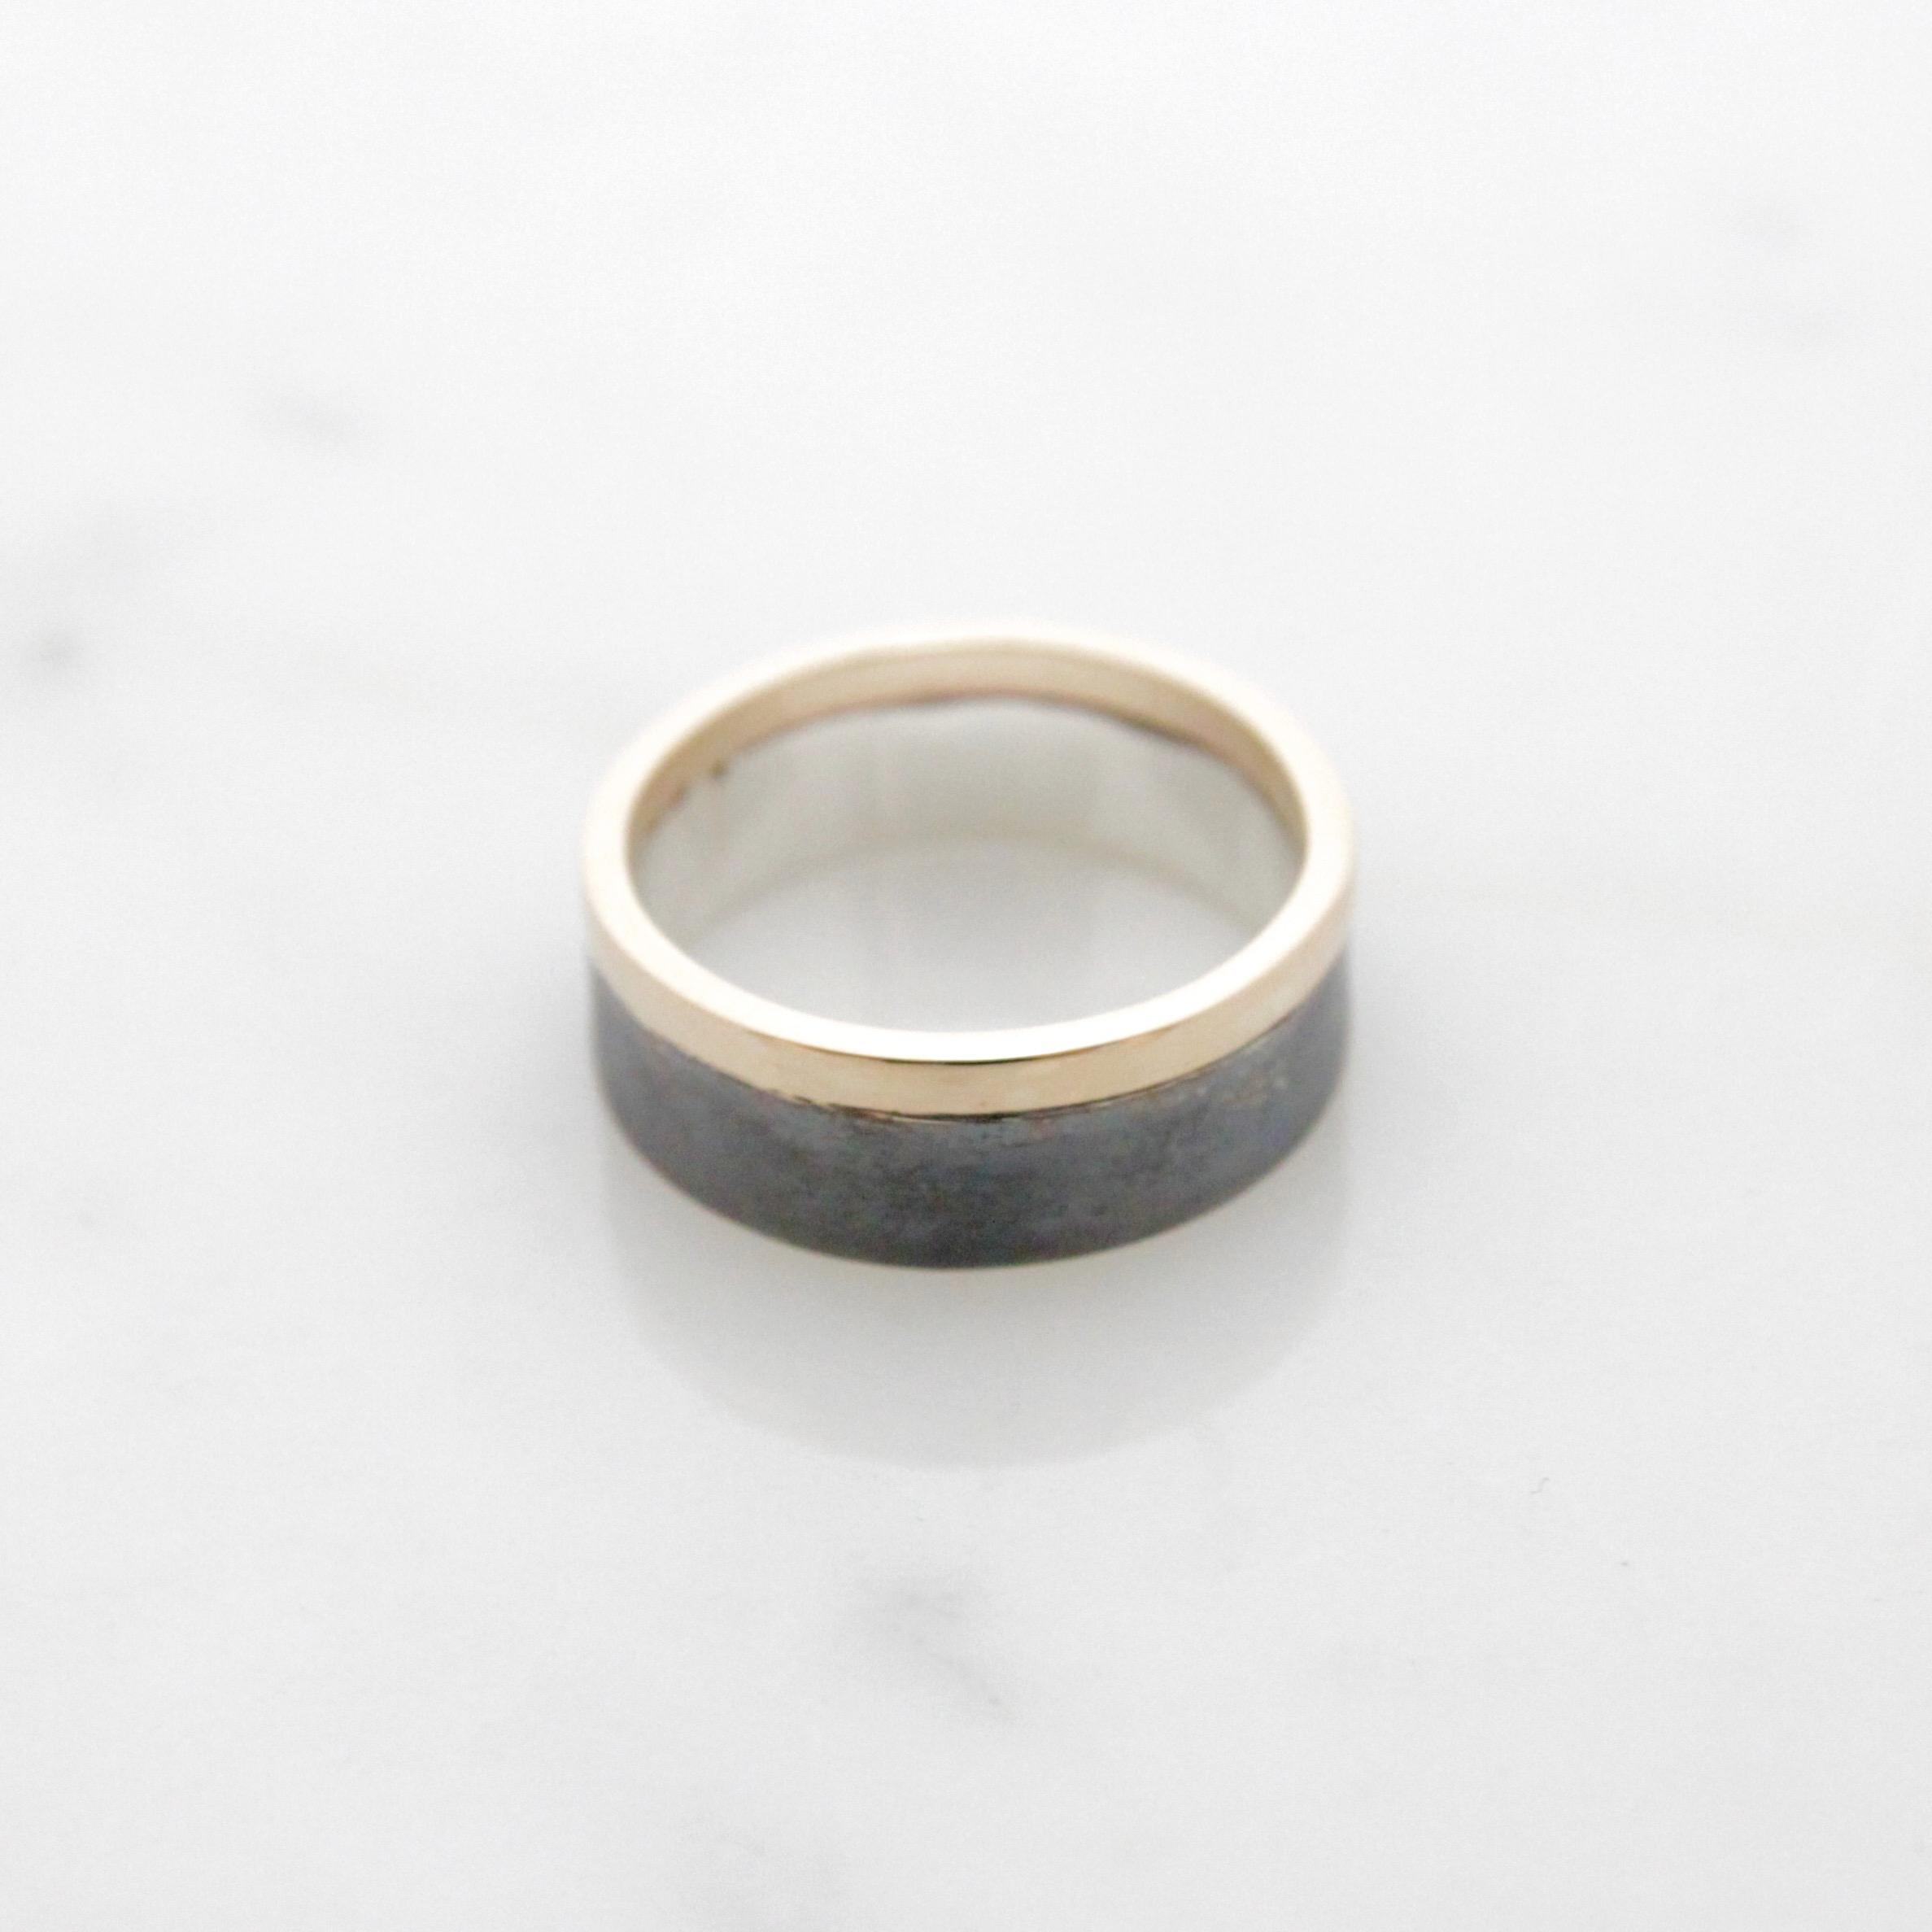 14k yellow & oxidized silver band